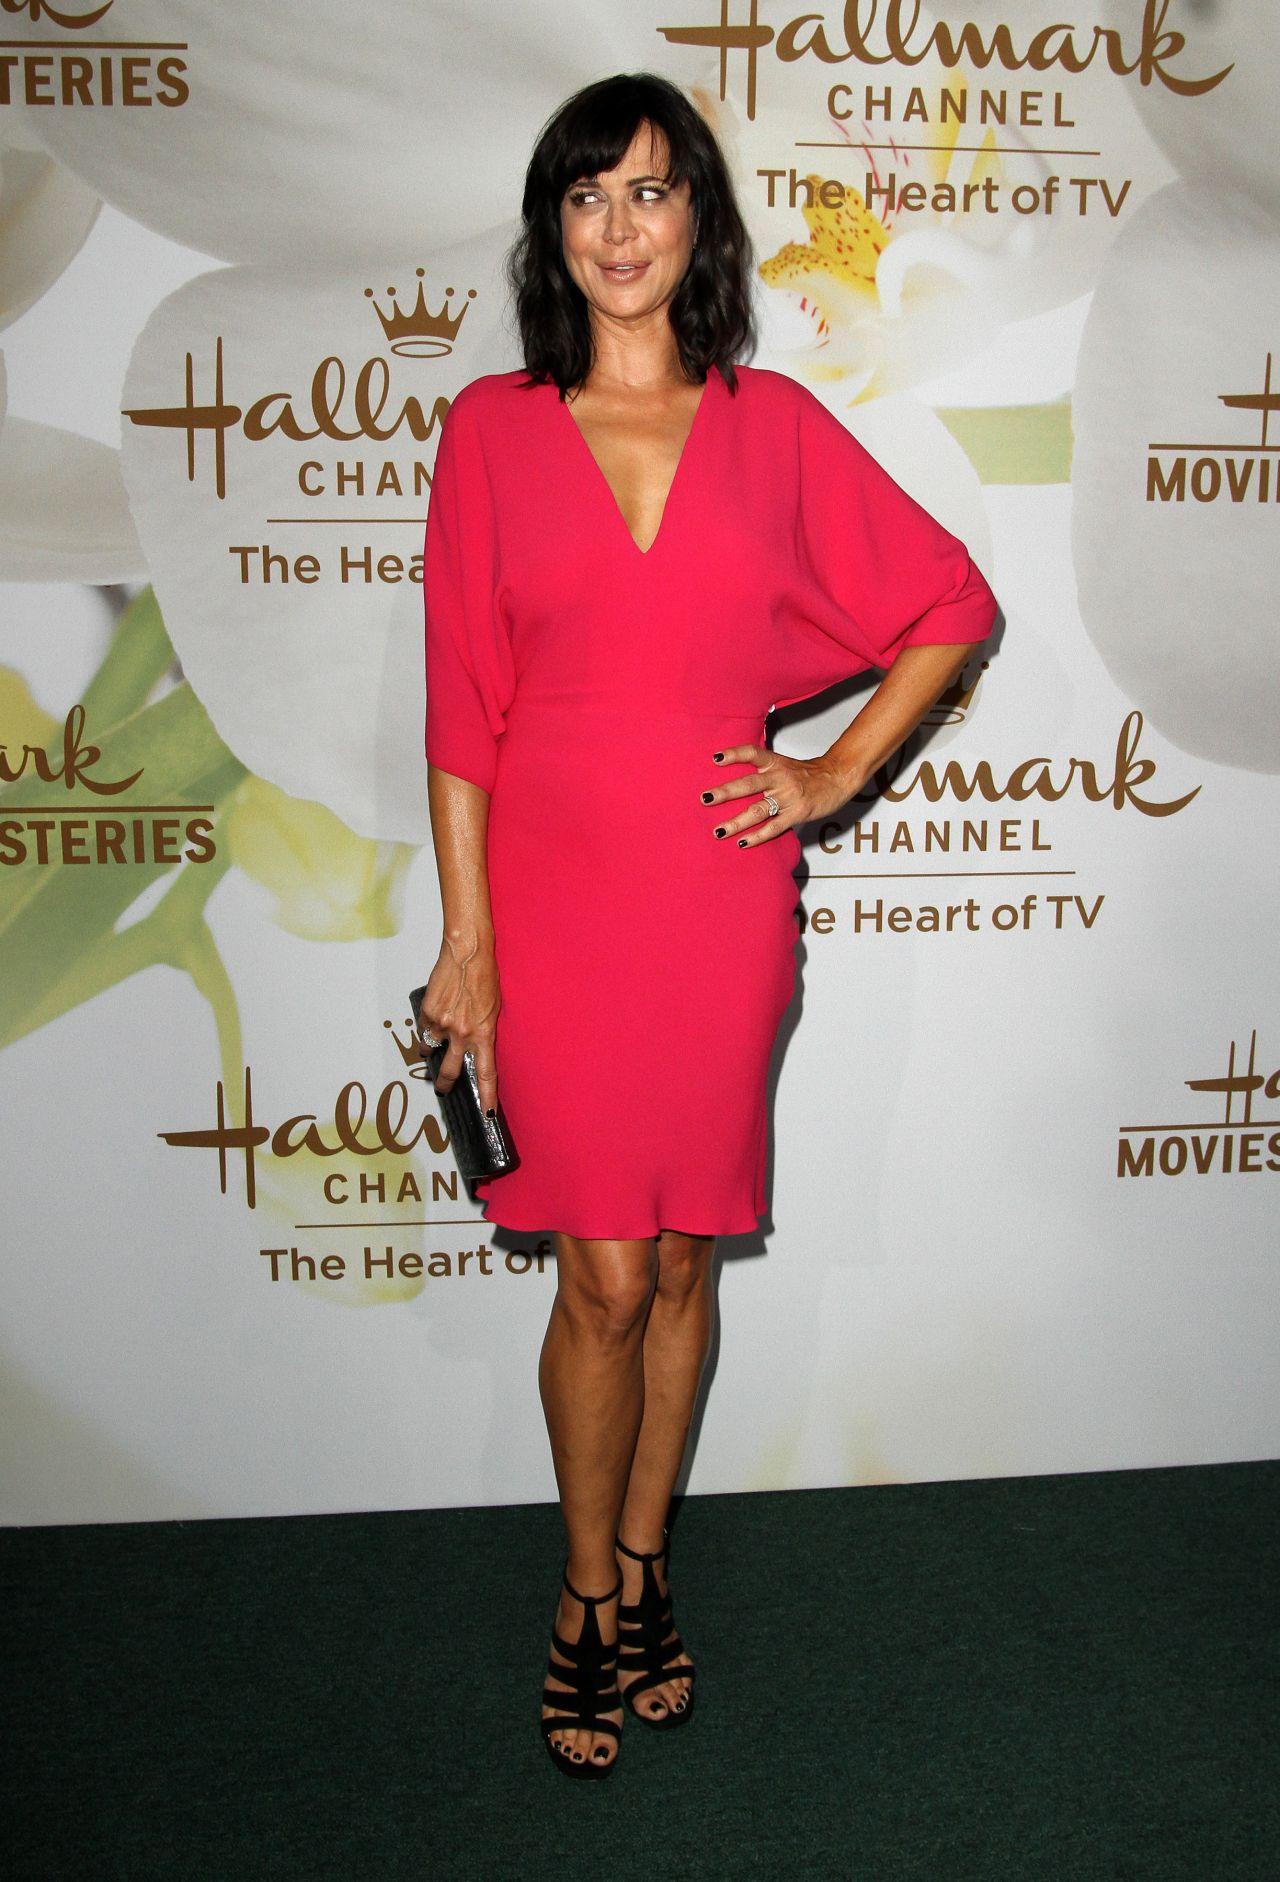 Catherine Bell Hallmark Evening Event At TCA Summer